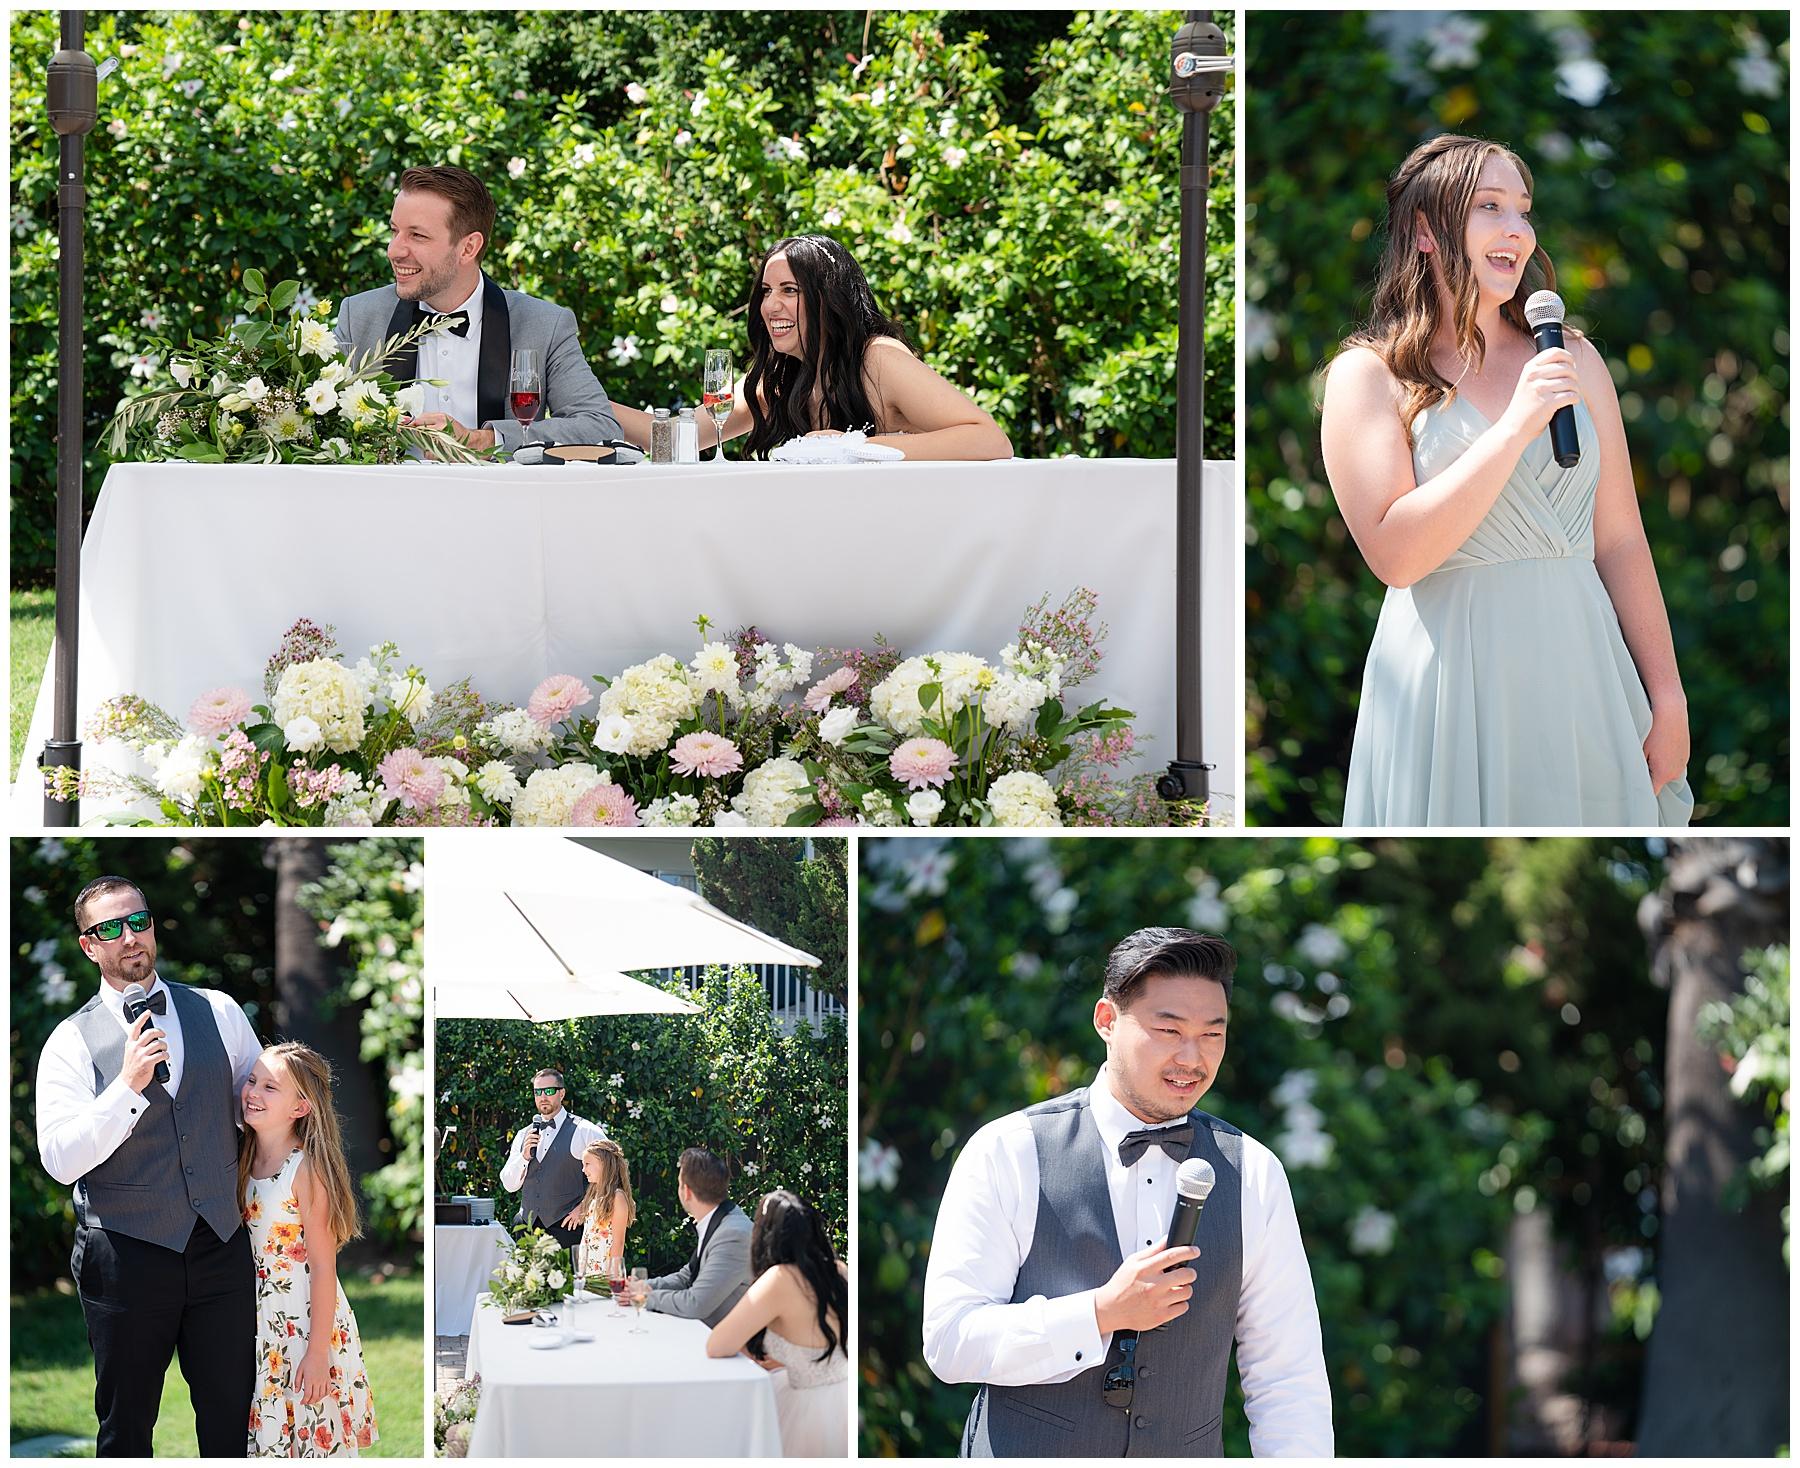 wedding toasts outdoors